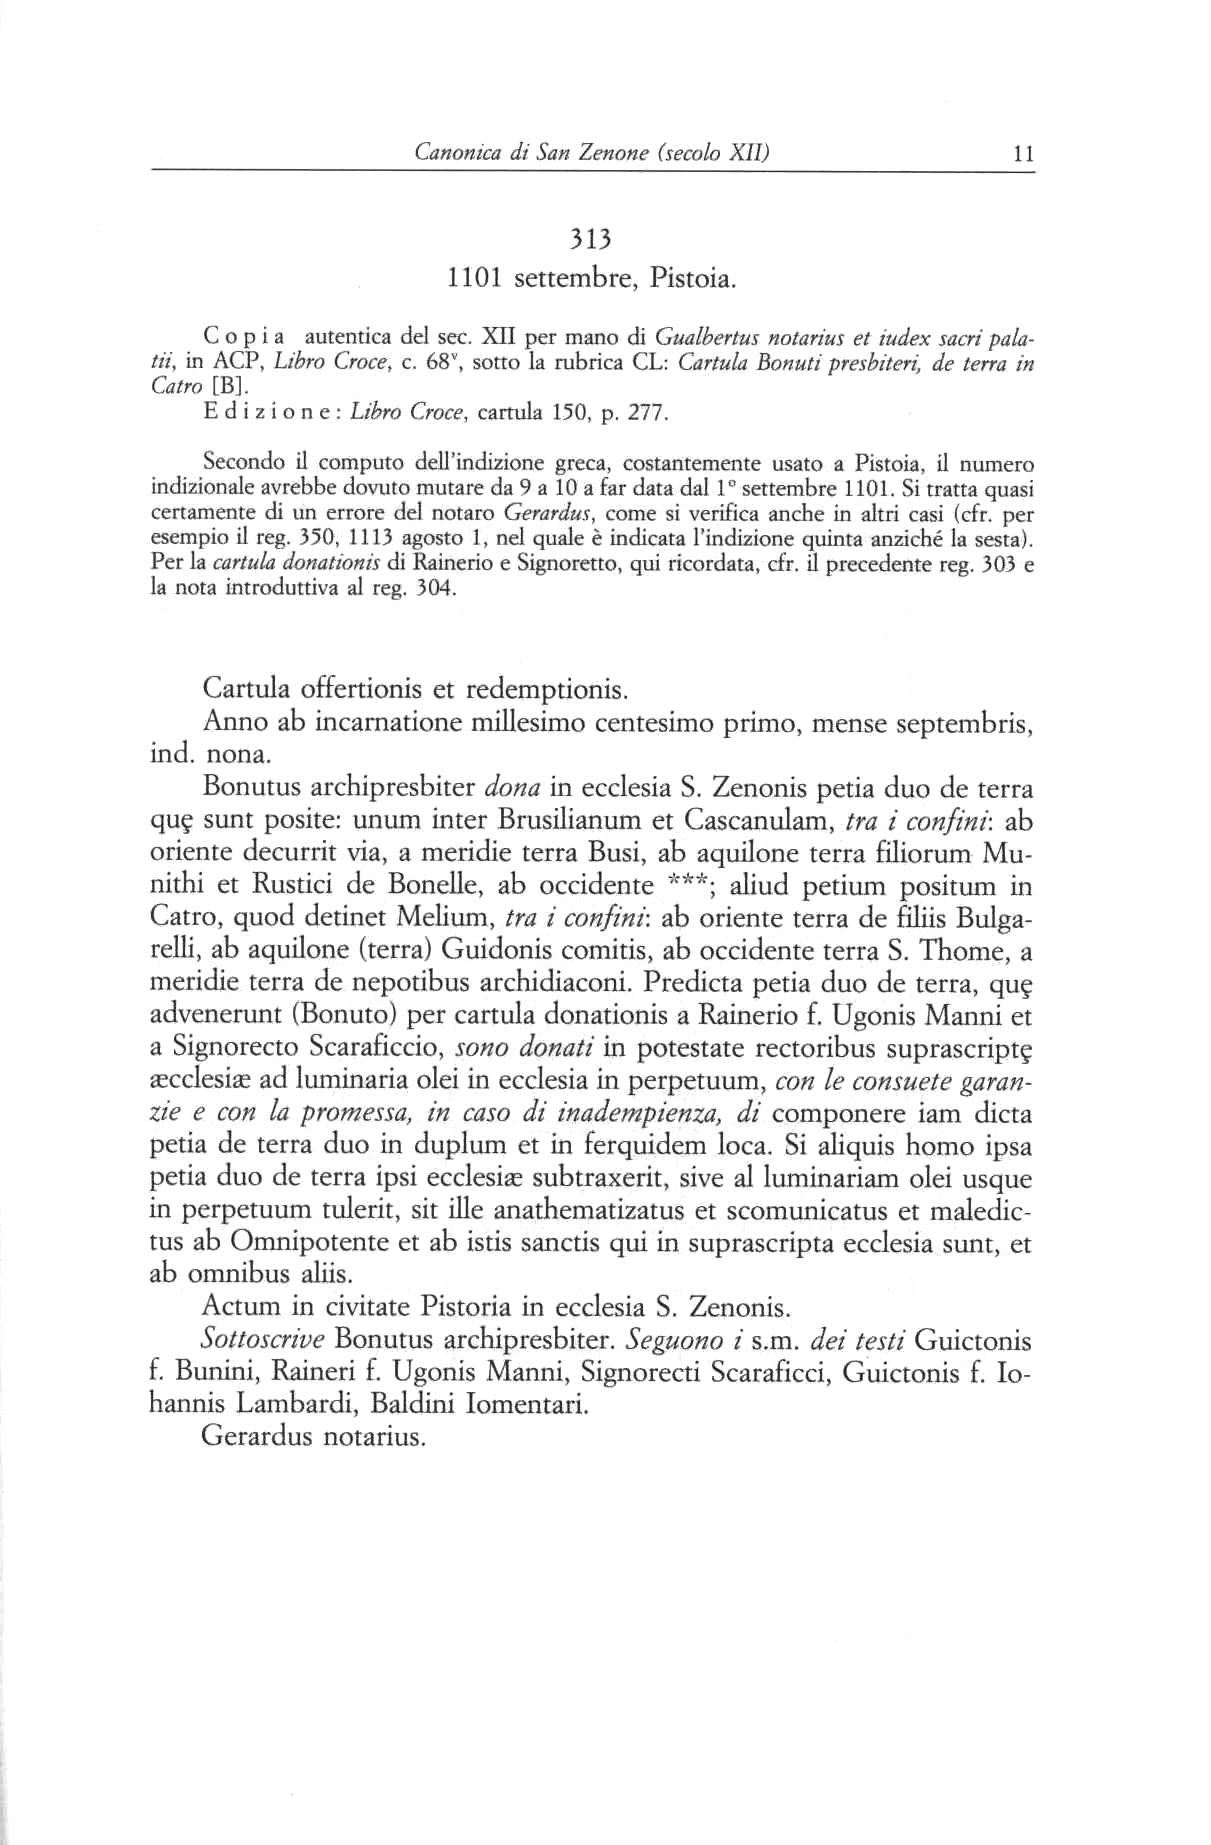 Canonica S. Zenone XII 0011.jpg